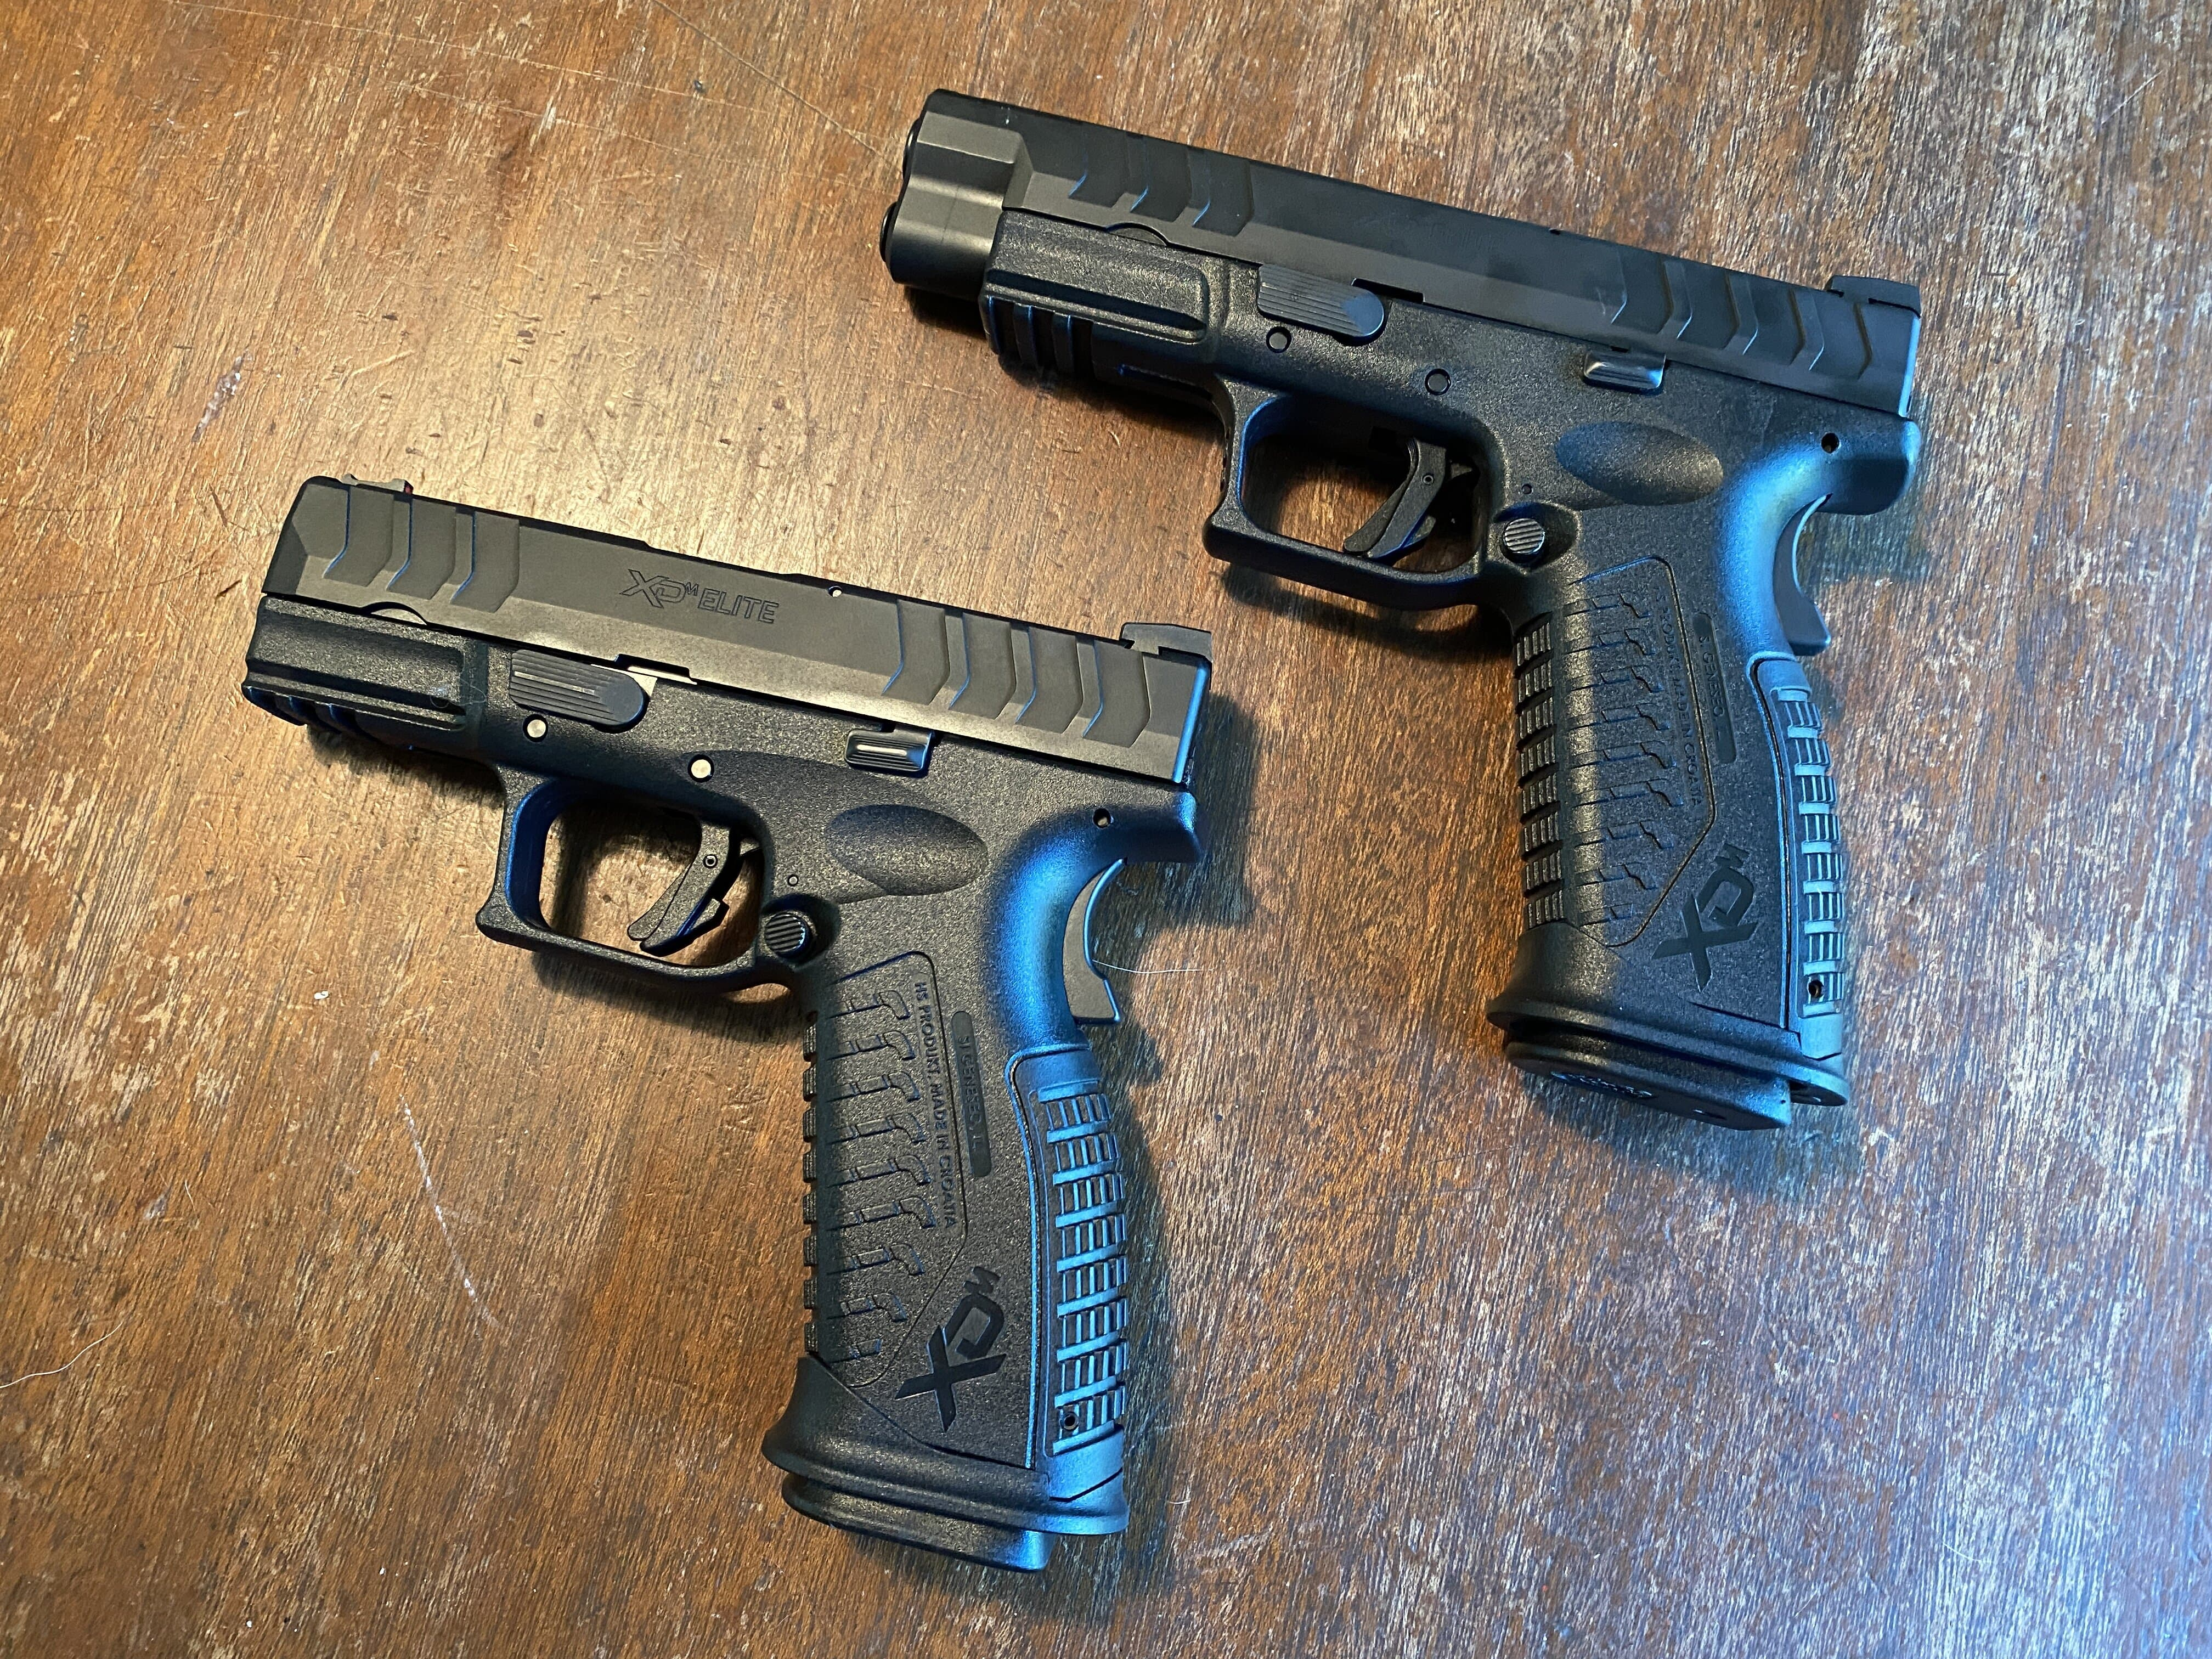 XD-M, XD-M Elite, Springfield XDM holsters, XDM holsters, Springfield Armory, Springfield XDM, XDM Elite, Elite pistol, CrossBreed Holsters, concealed carry, IWB, OWB, holster, holsters, best holster for Springfield Armory, XDM, handgun, gun review, pistol,